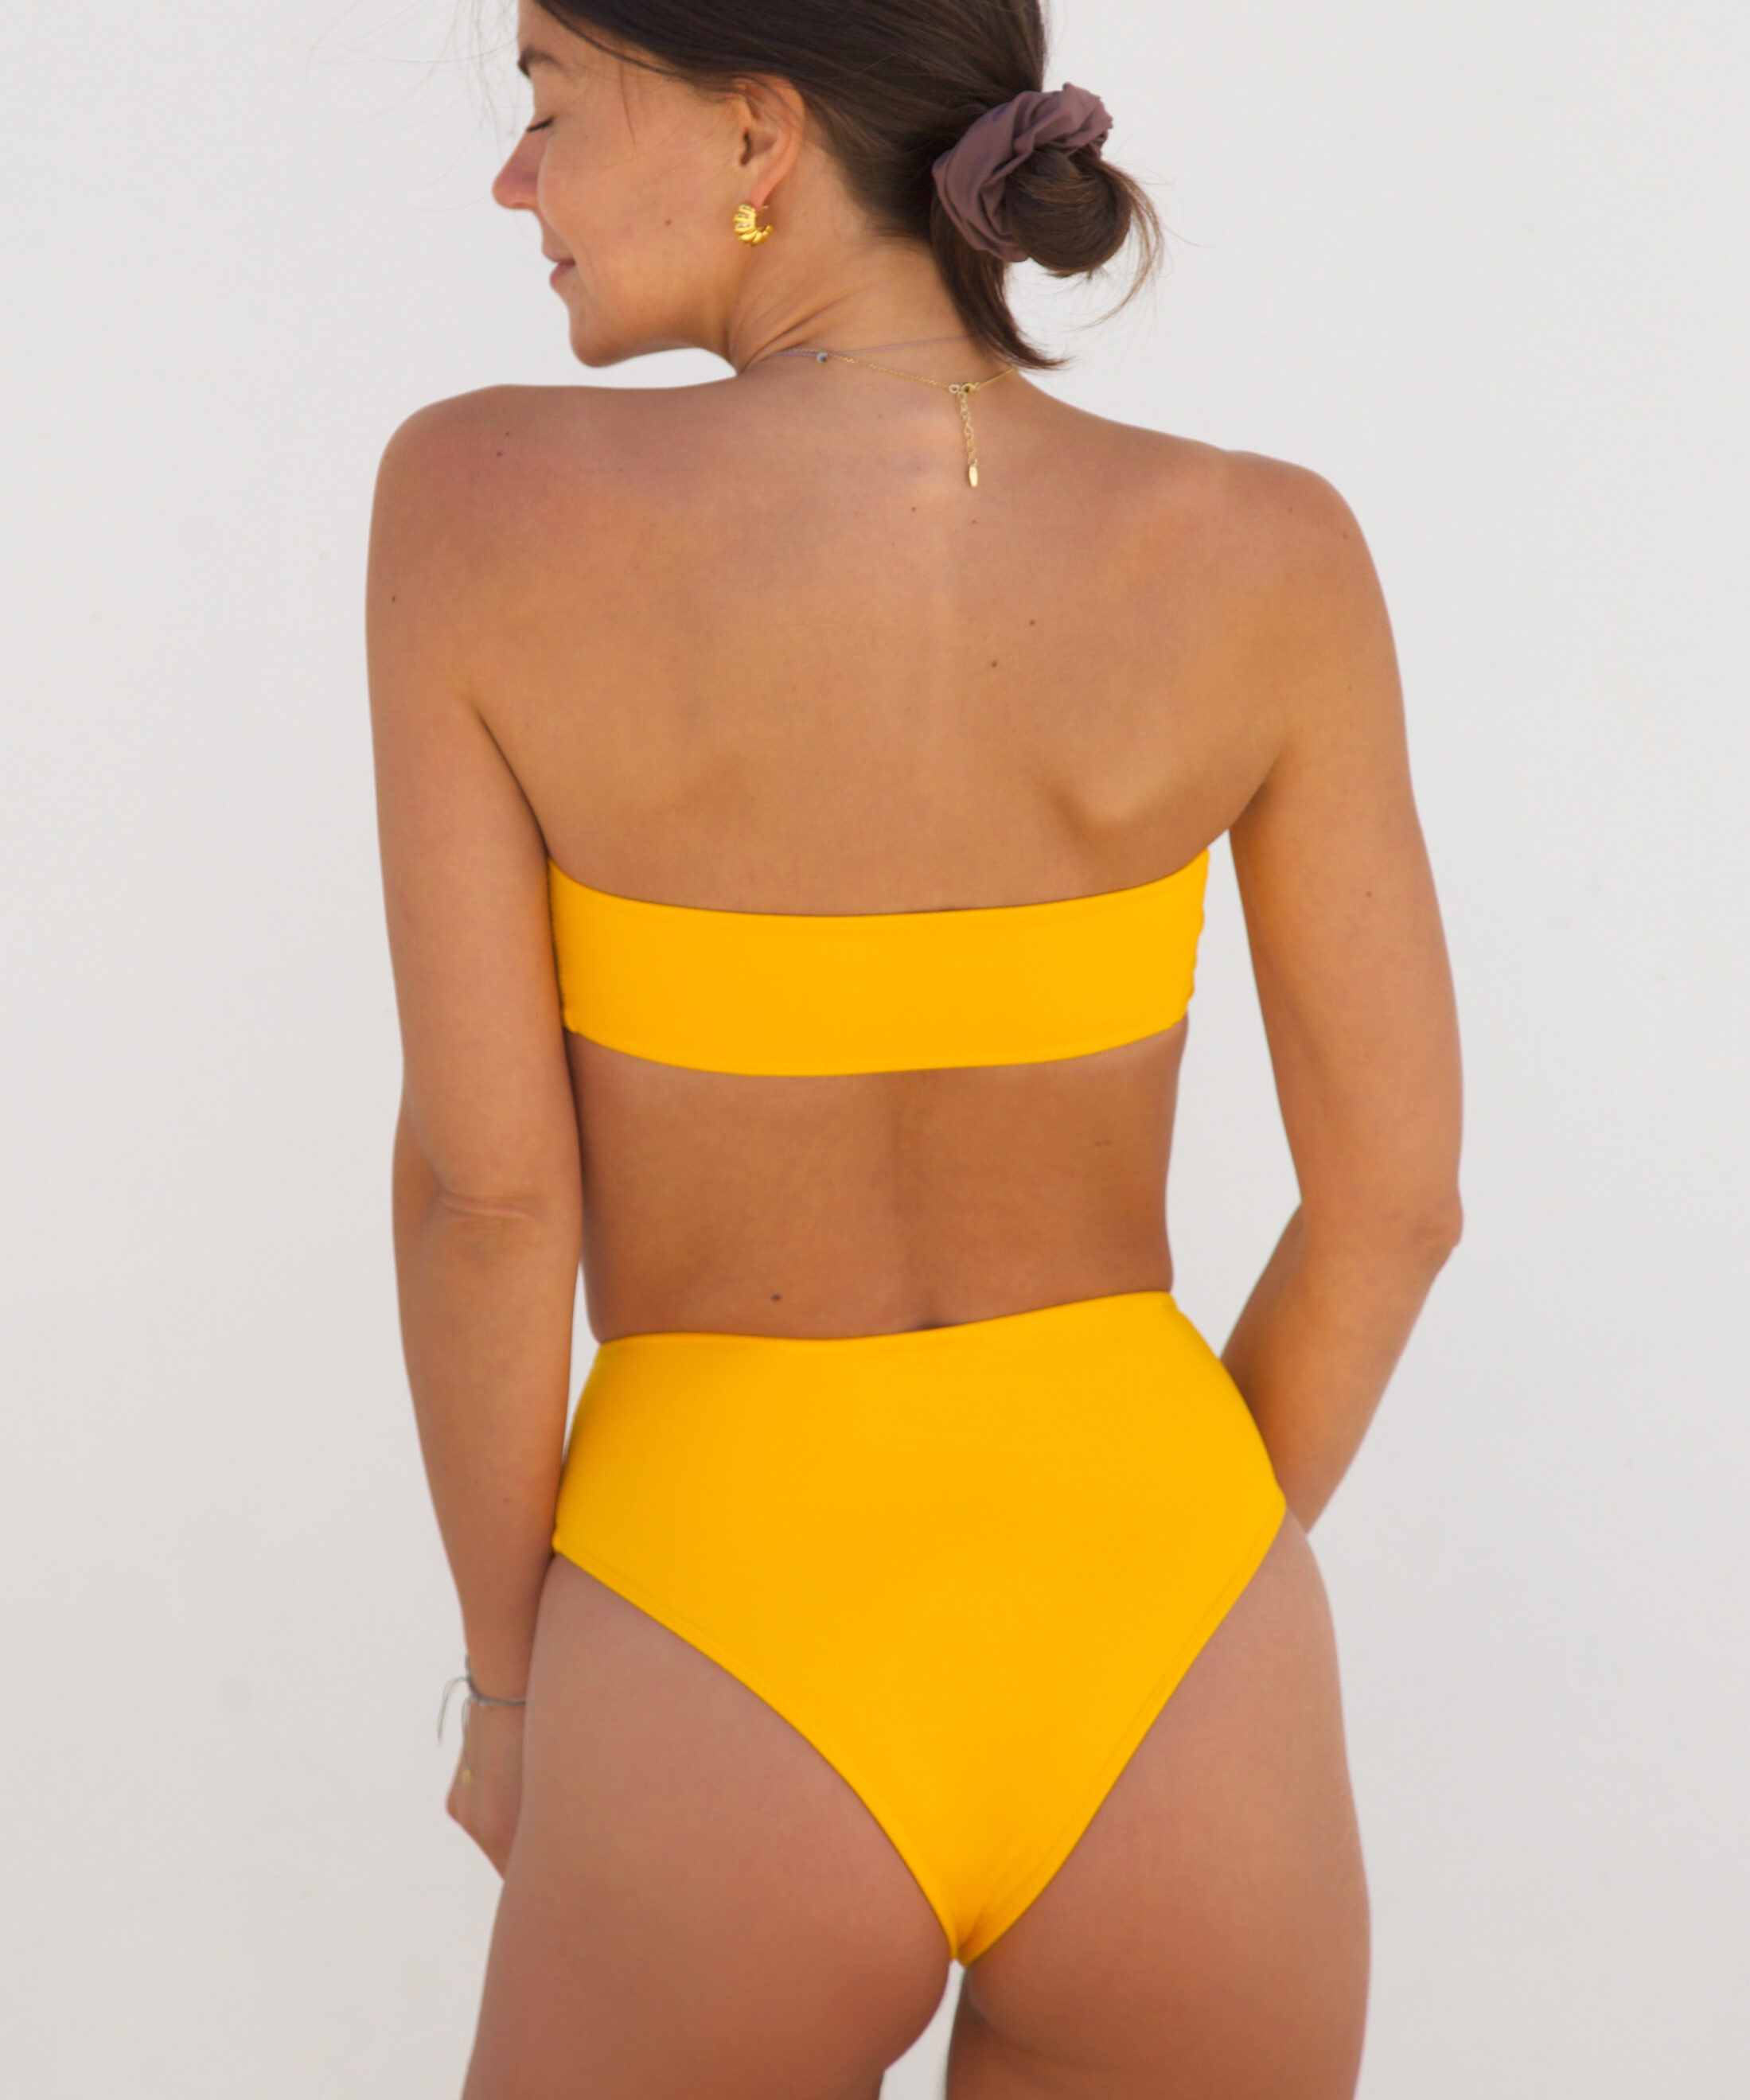 Piwari Sustainable Swimwear Bikini Empress Sprint Back